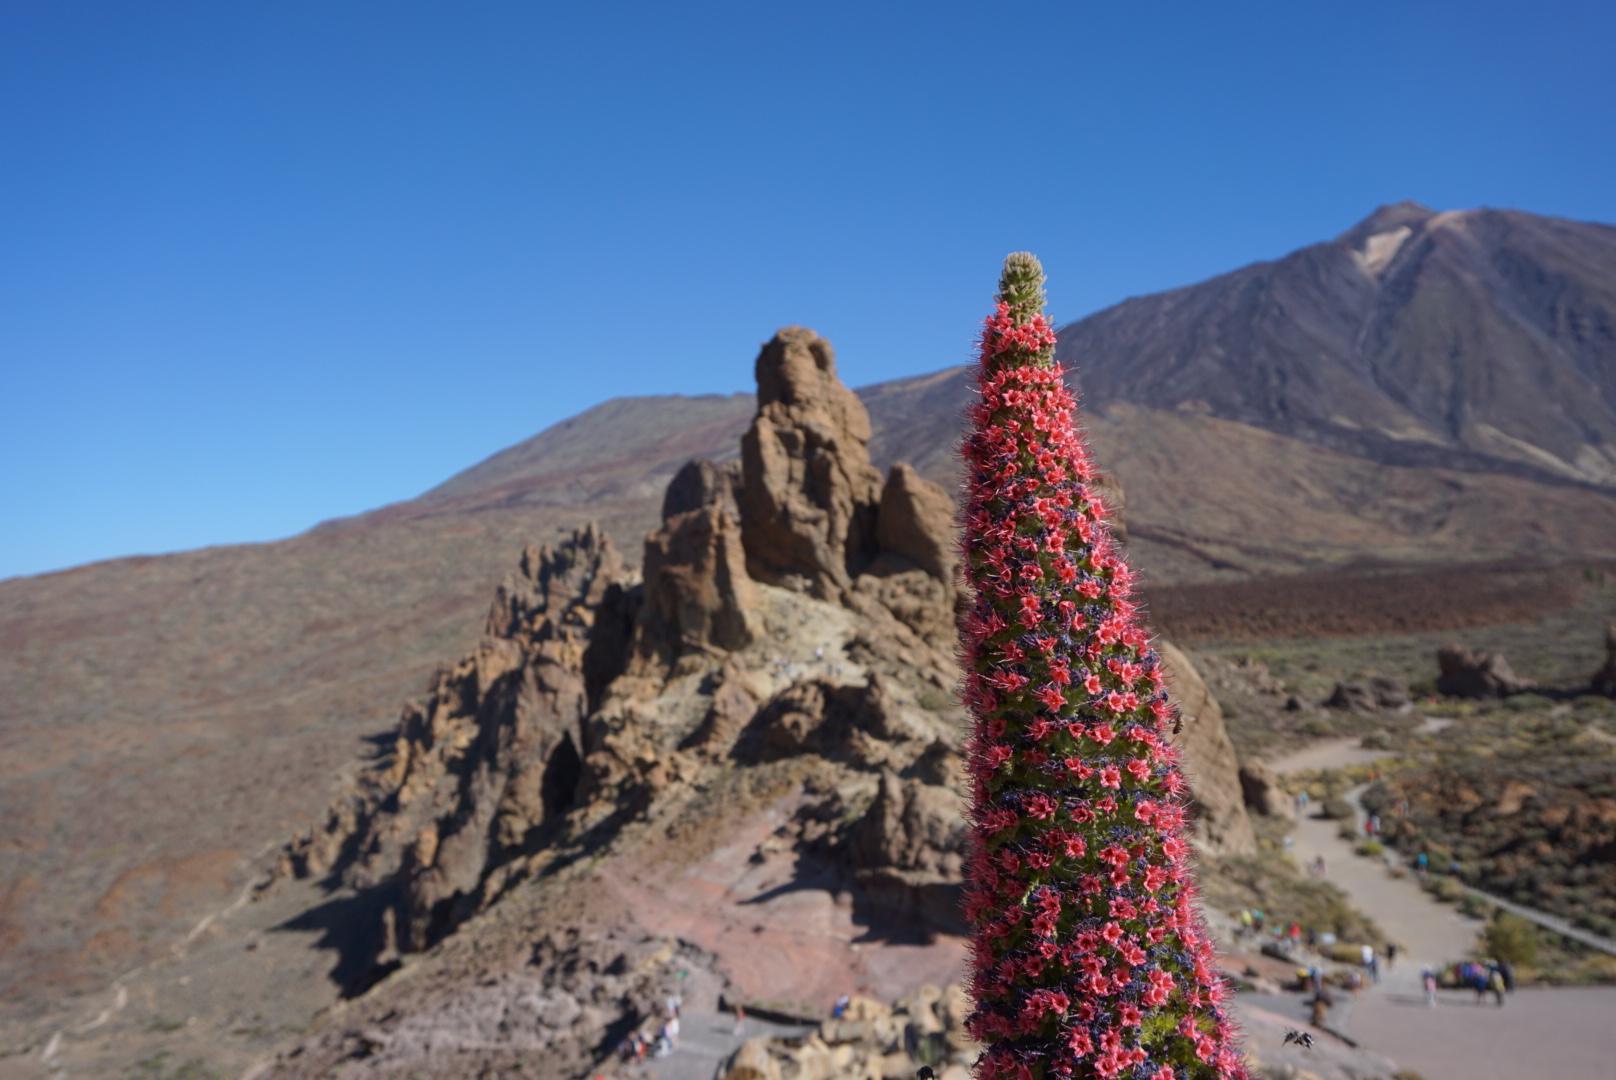 Mount Teide - Tenerife, Canary Islands